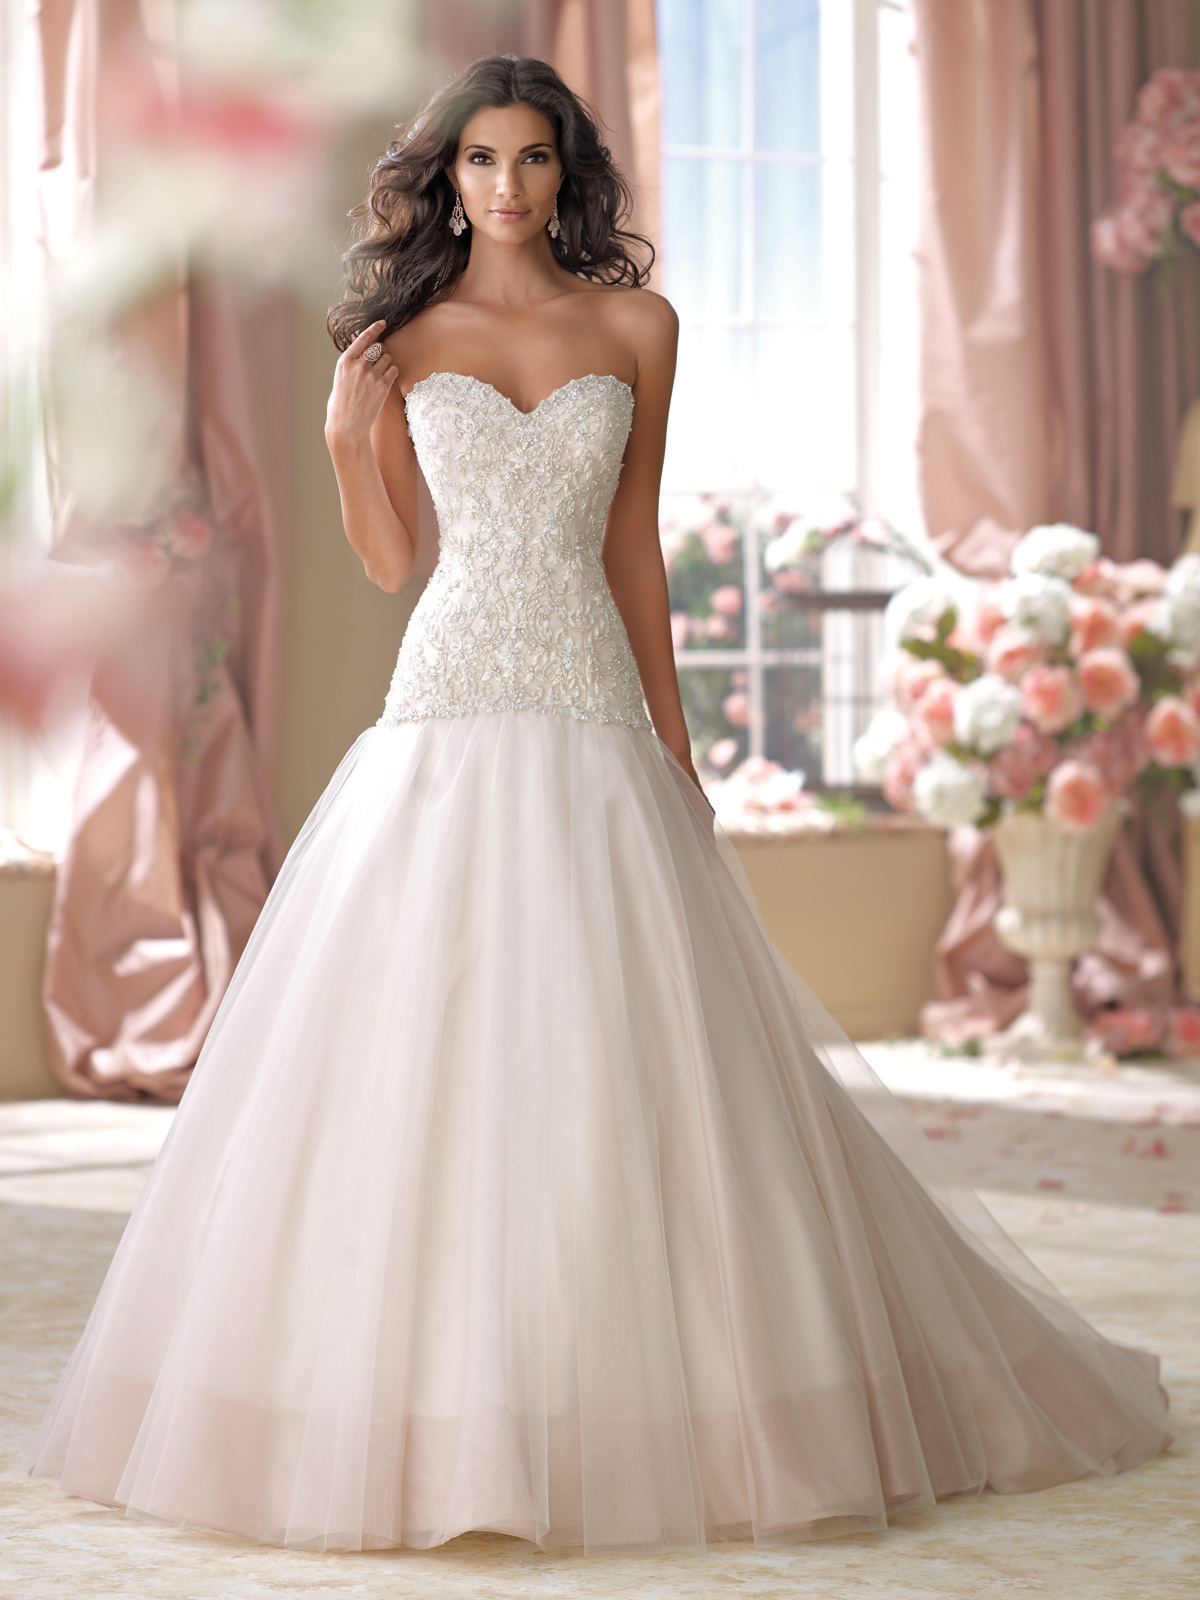 Wedding Dresses For   Sunshine Coast : Home mon cheri by david tutera cora